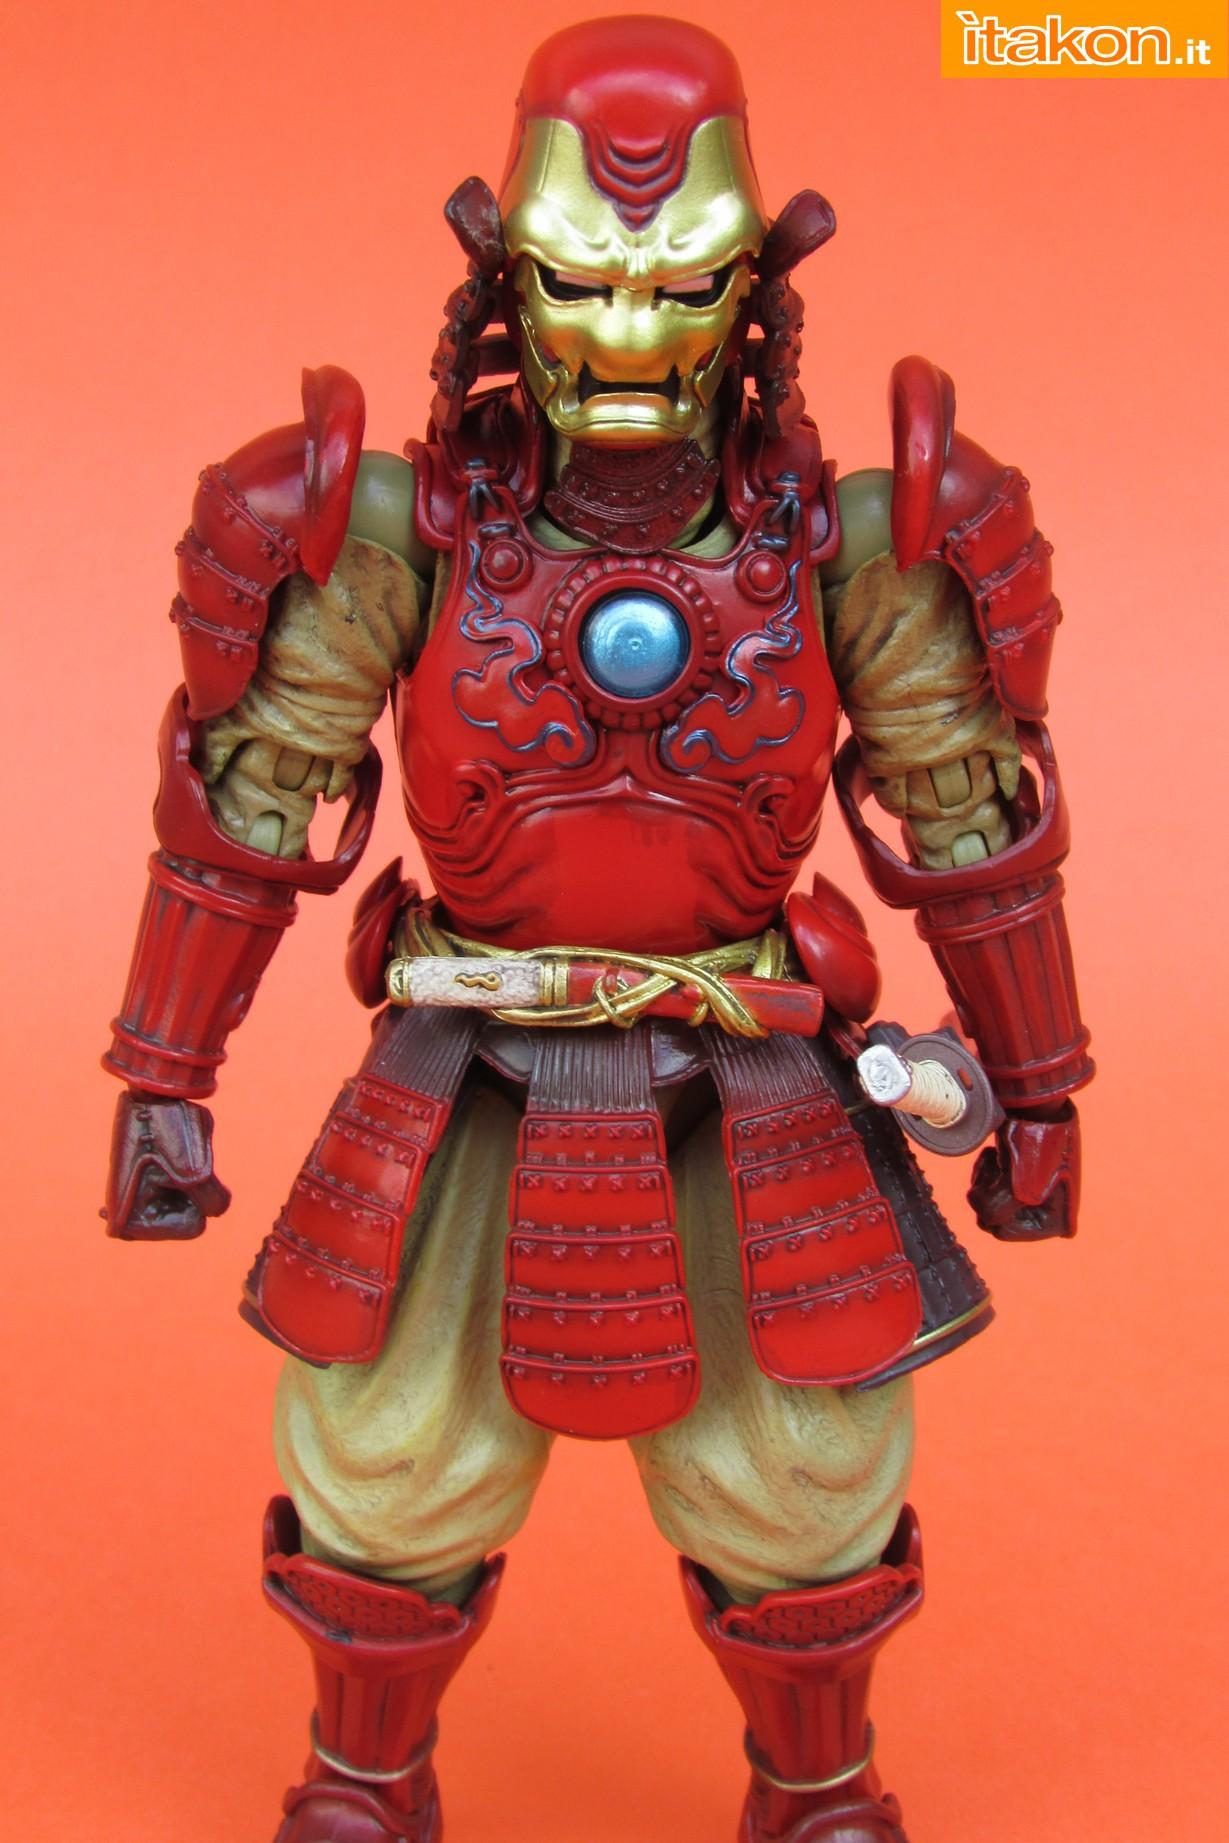 Link a Marvel Comics Koutetsu Samurai Iron Man Mark 3 Meishou MANGA REALIZATION review Bandai Itakon.it15